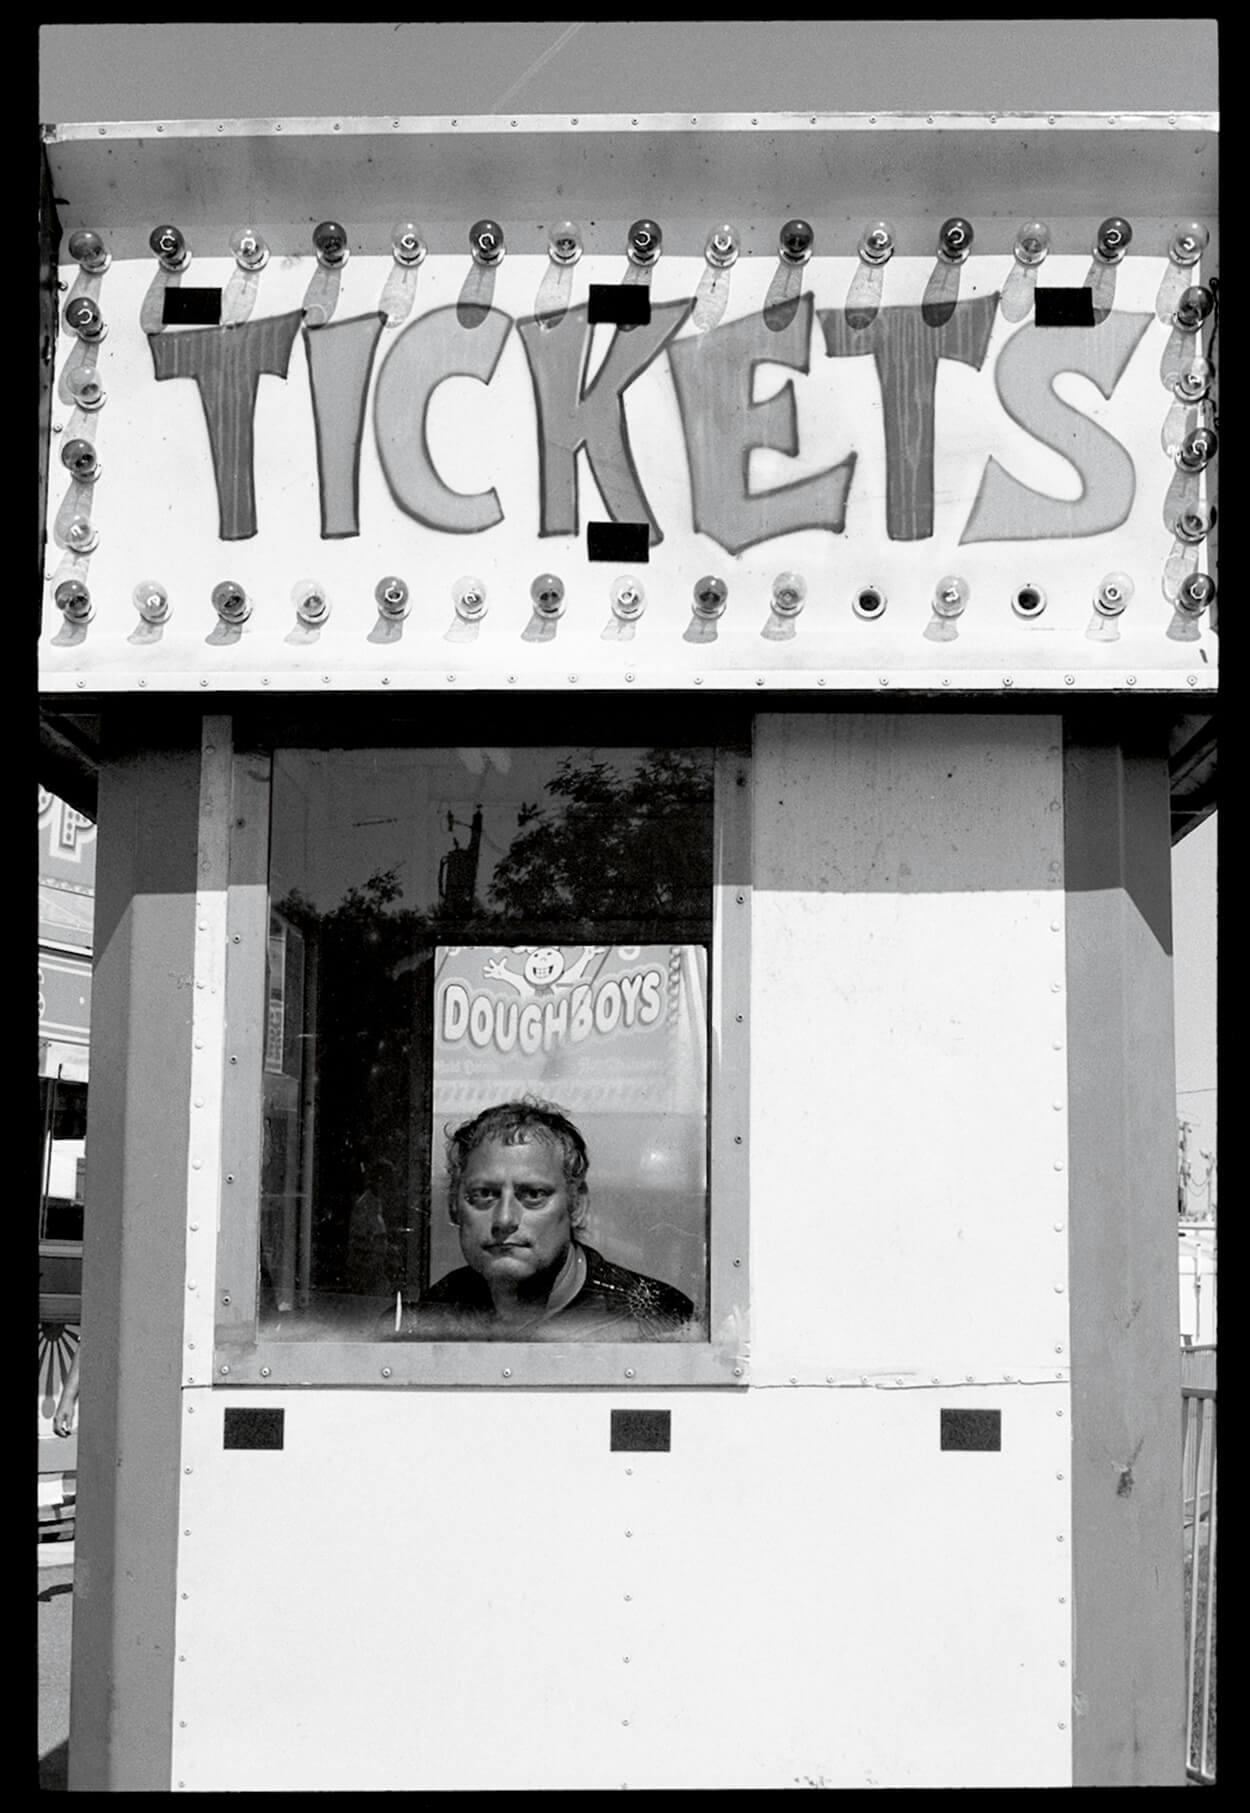 Tickets documentary